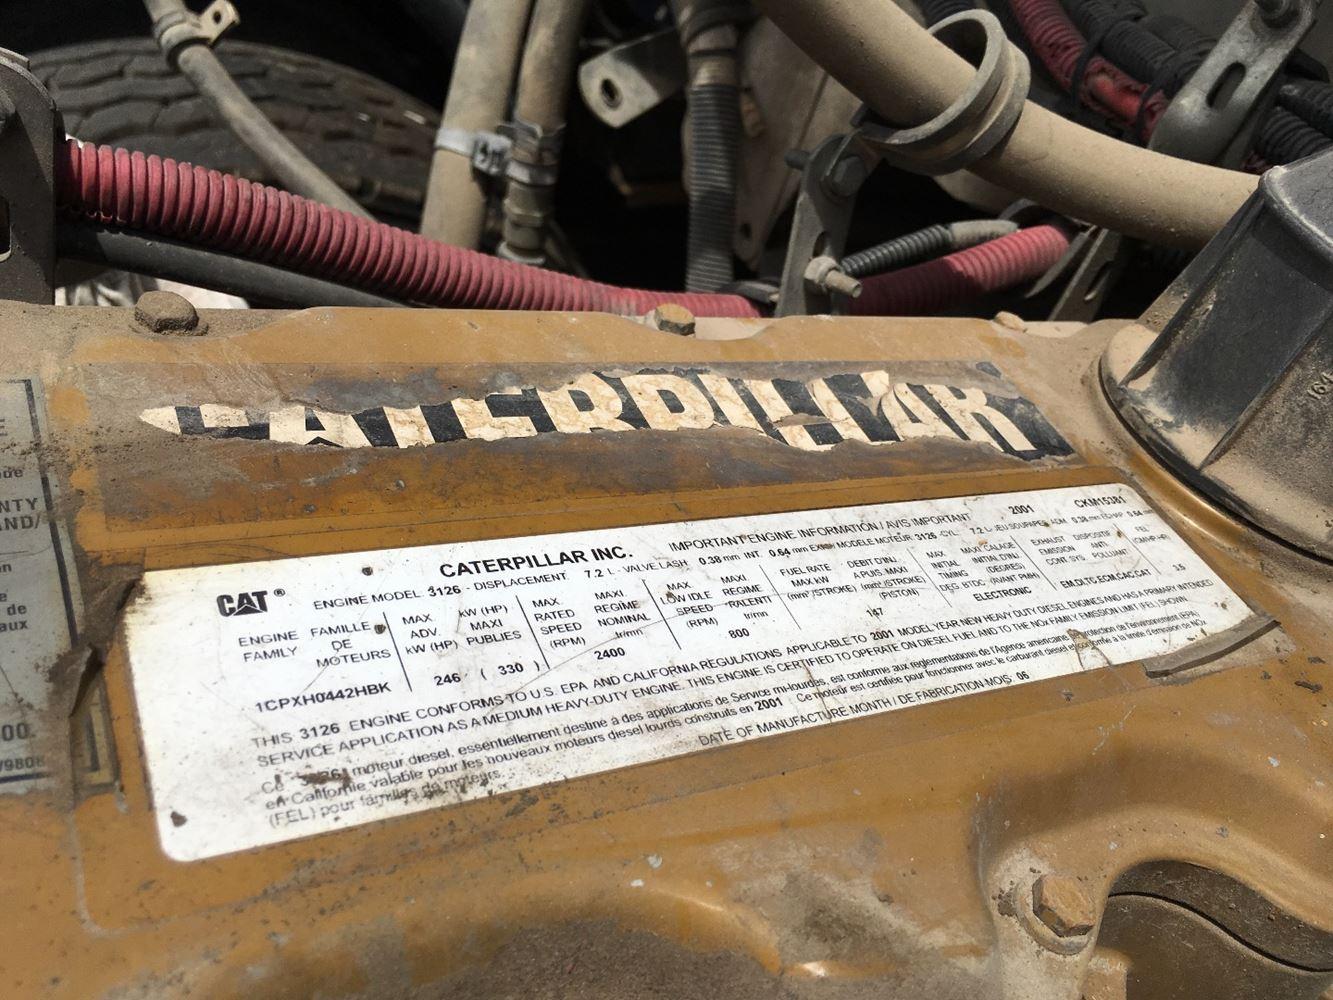 2002 Caterpillar 3126E (Stock #SV-1425-1) | Engine Assys | TPITruck Parts Inventory